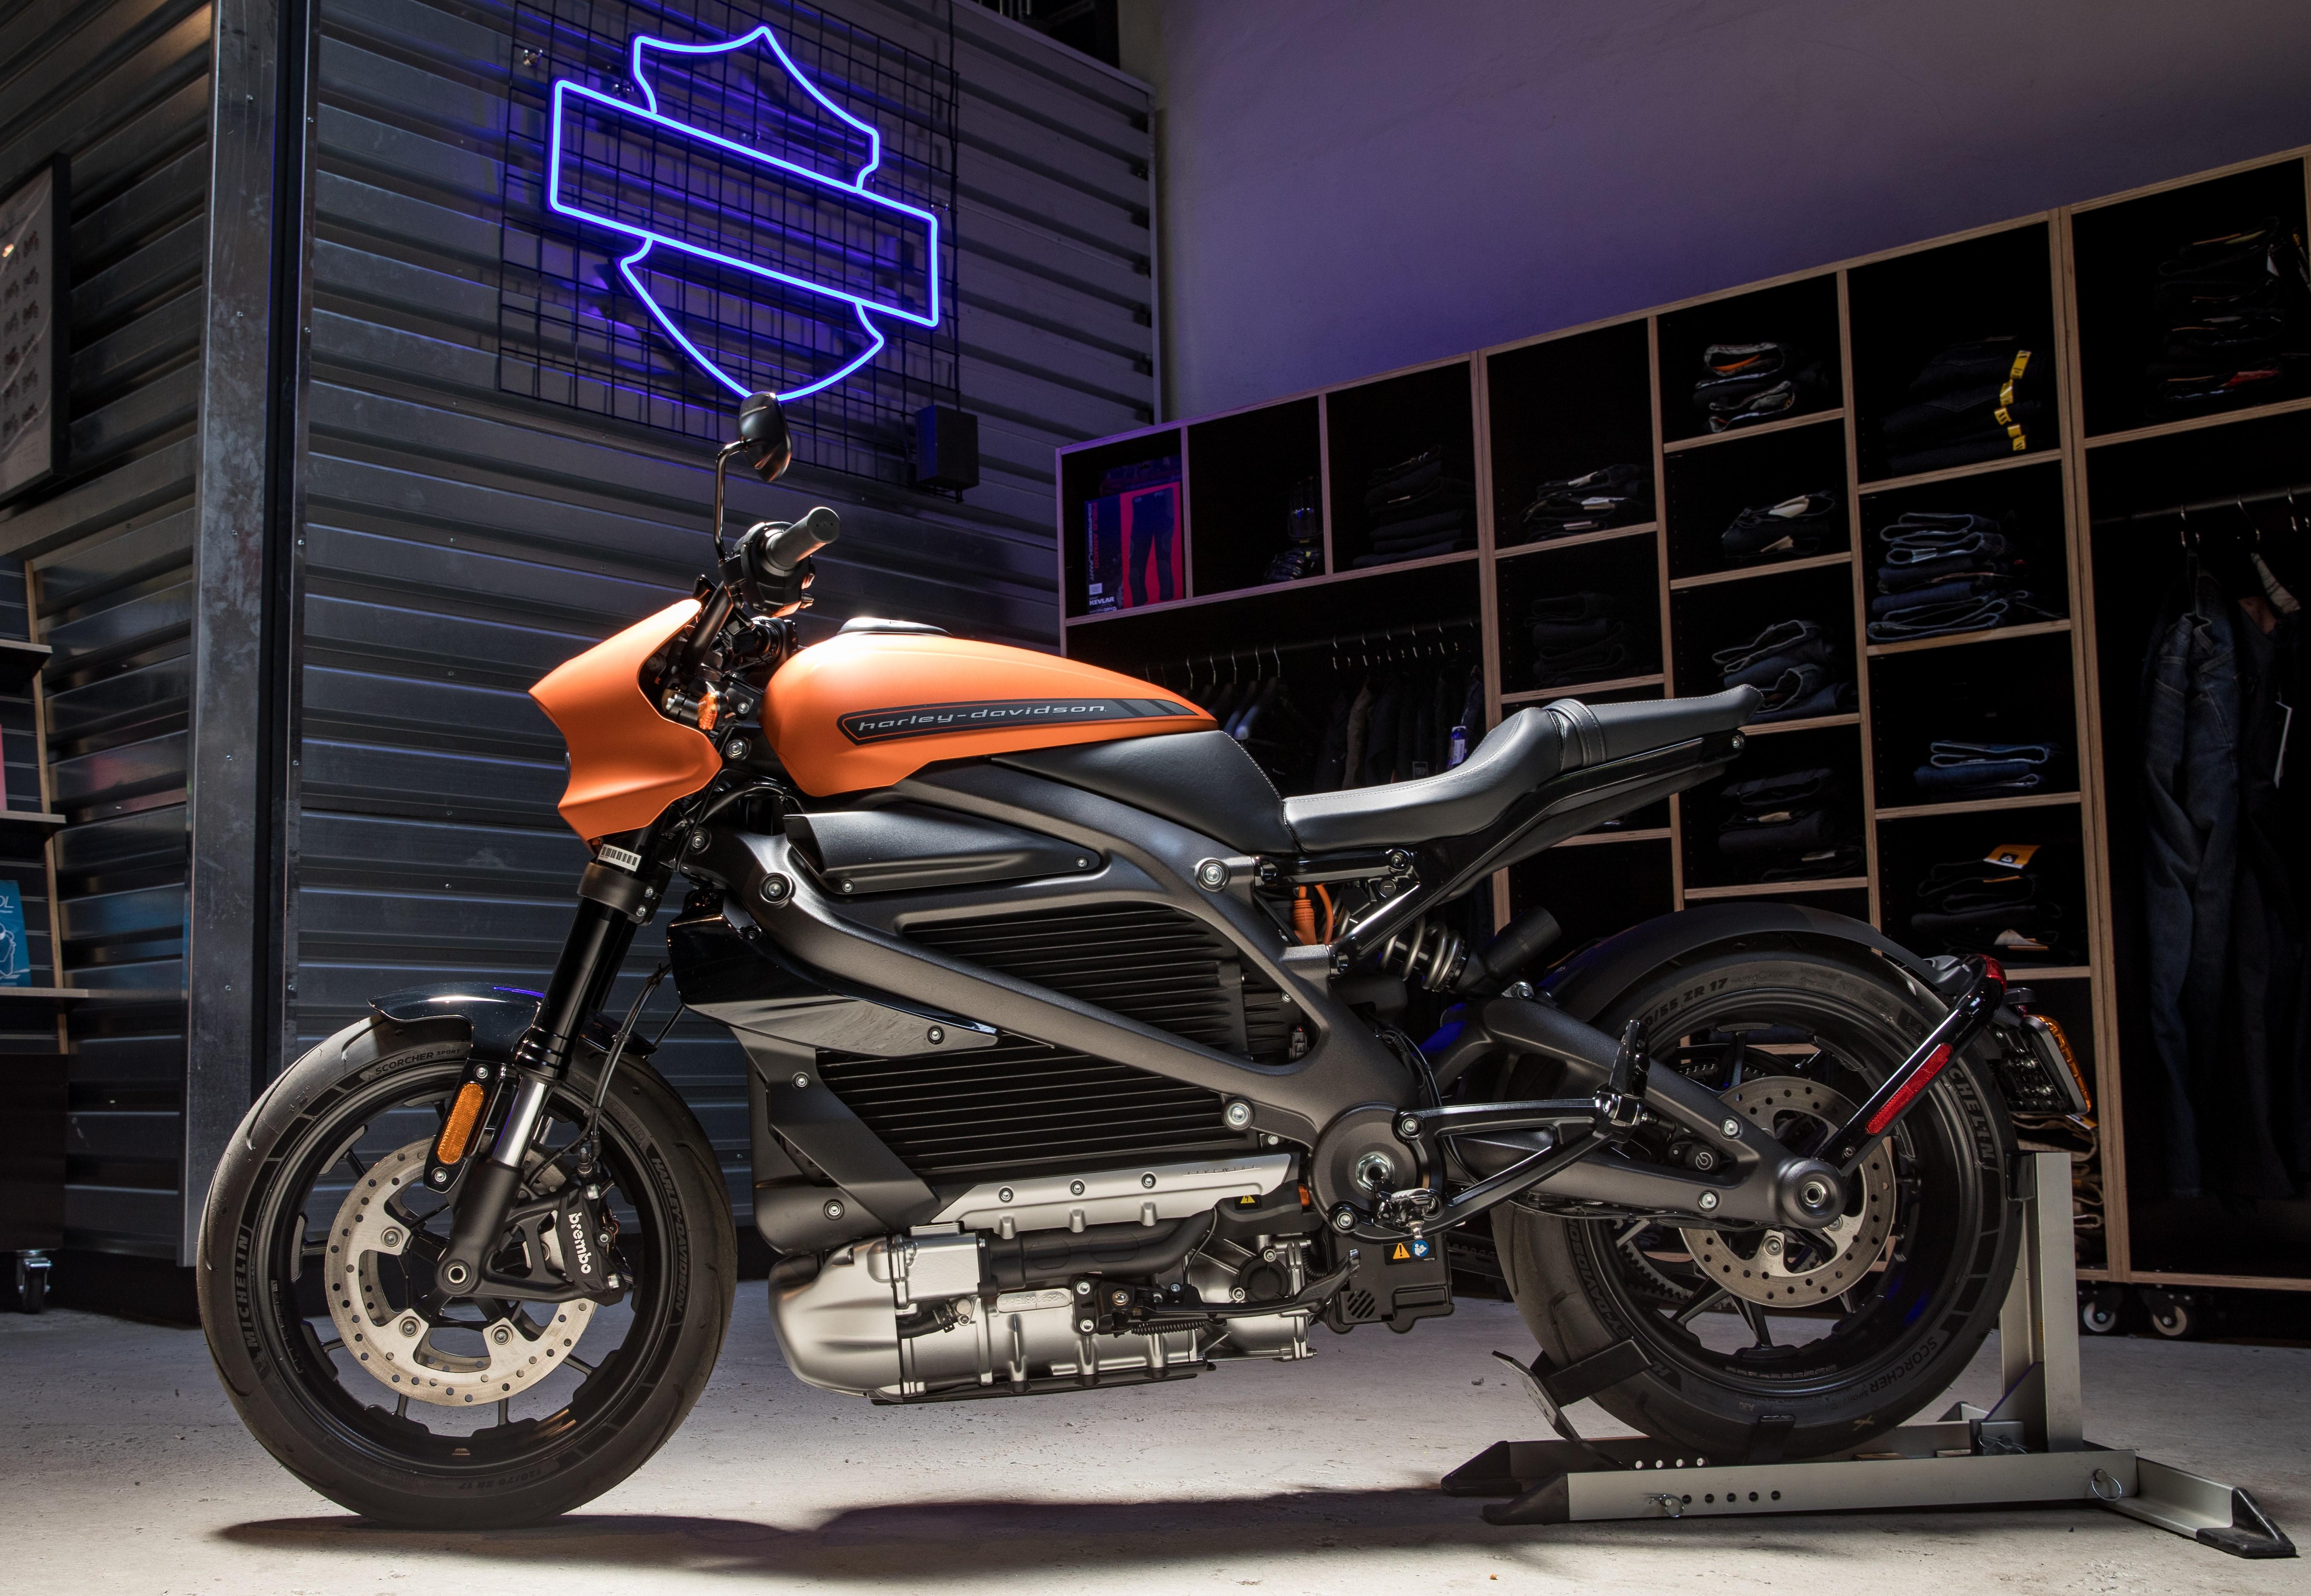 Harley Davidson Livewire static 1